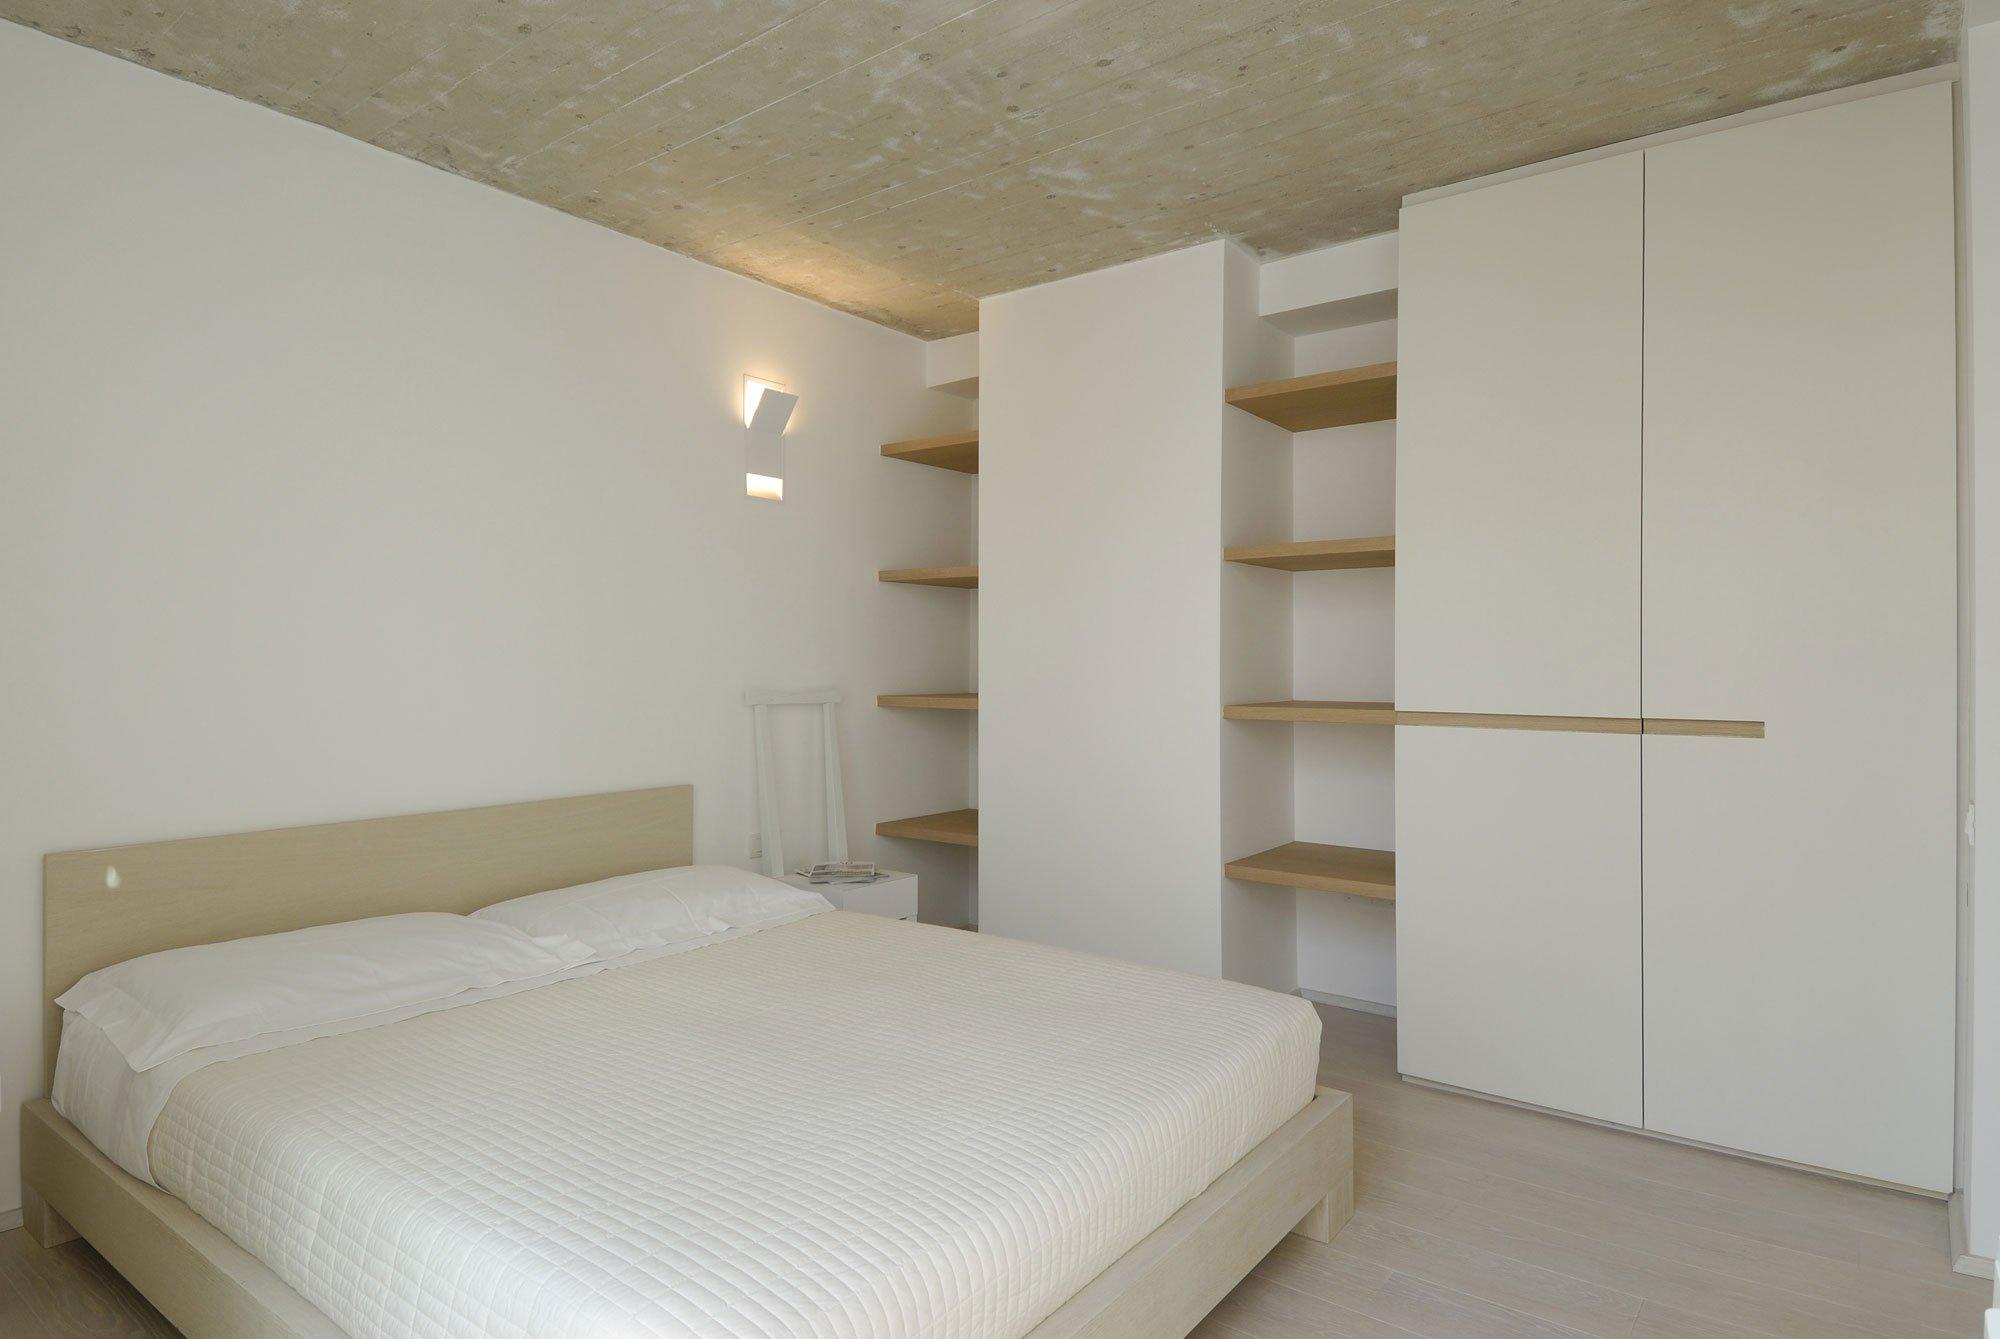 House-in-Sardinia-12